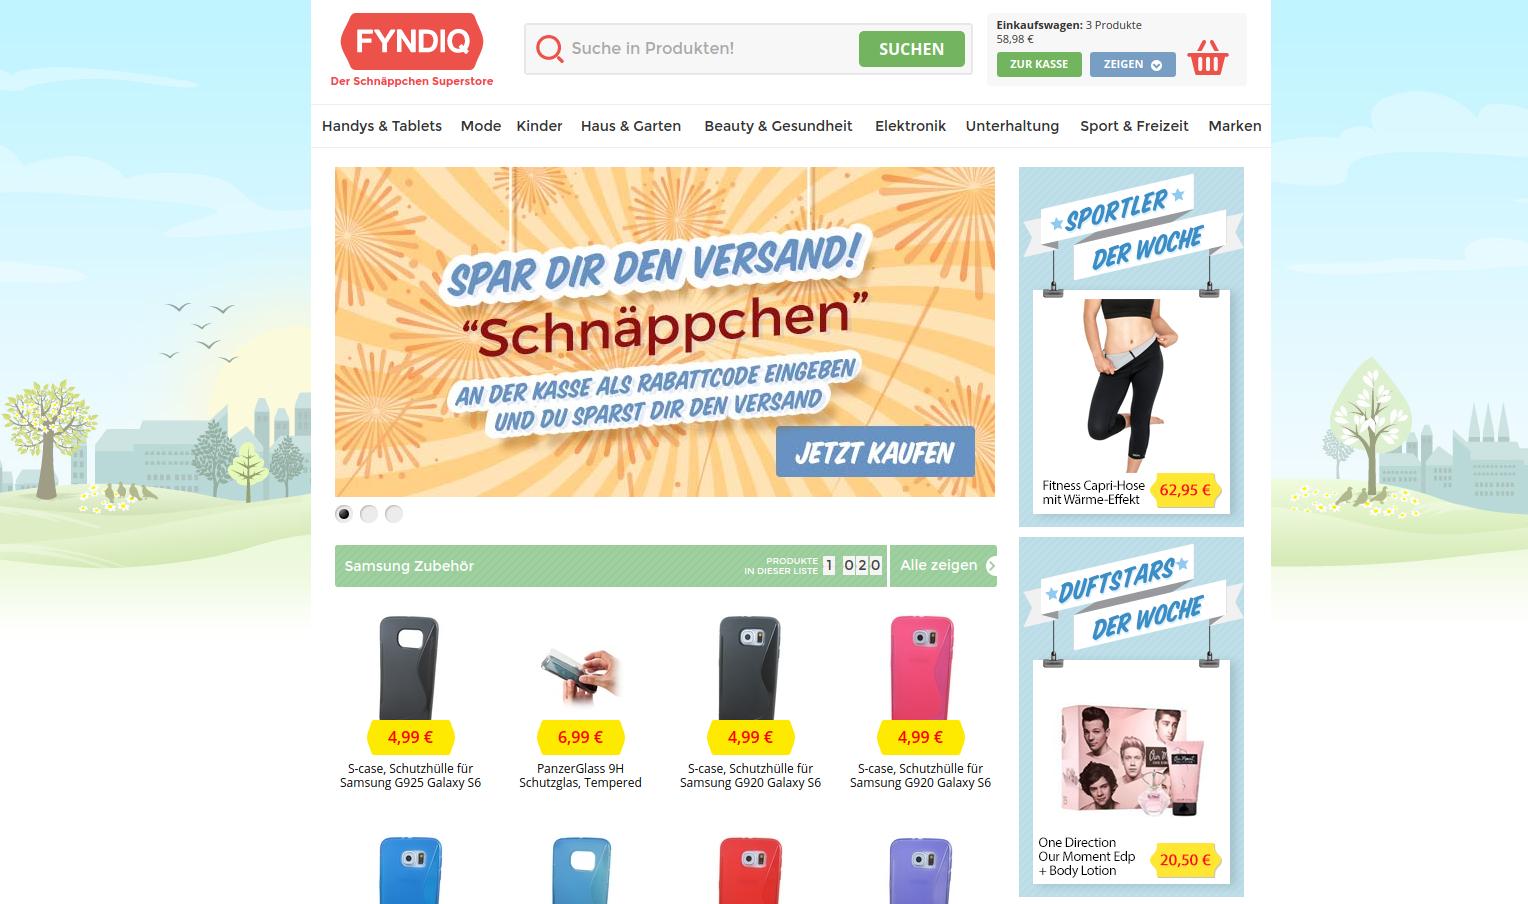 fyndiq kontakt mail